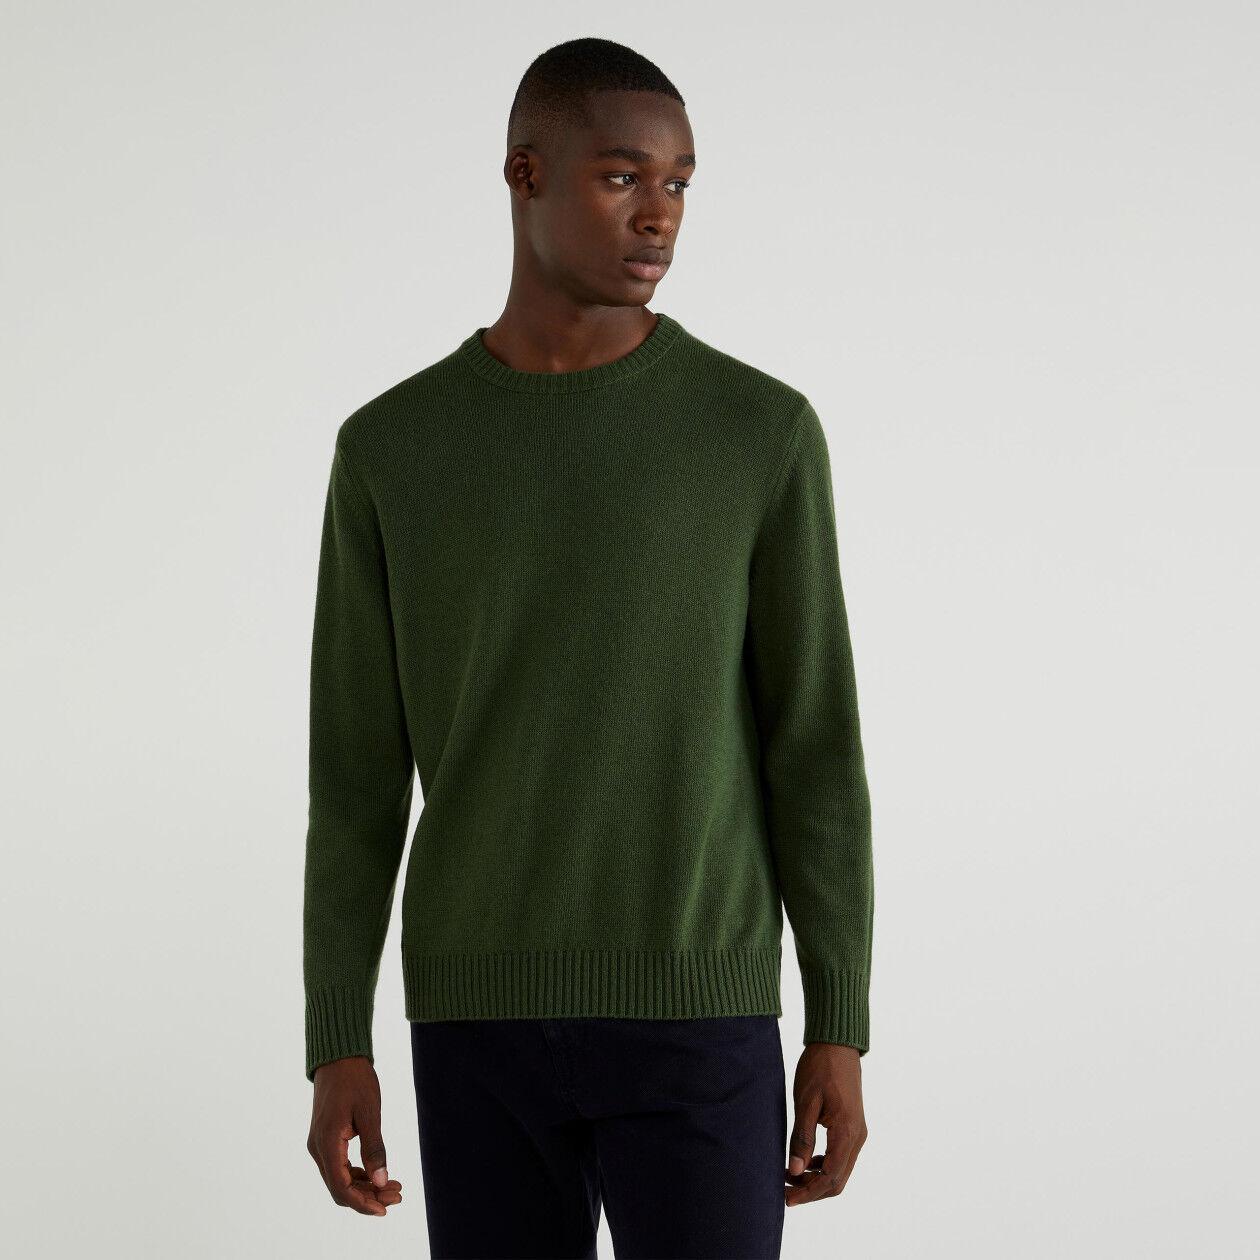 Cashmere blend crew neck sweater